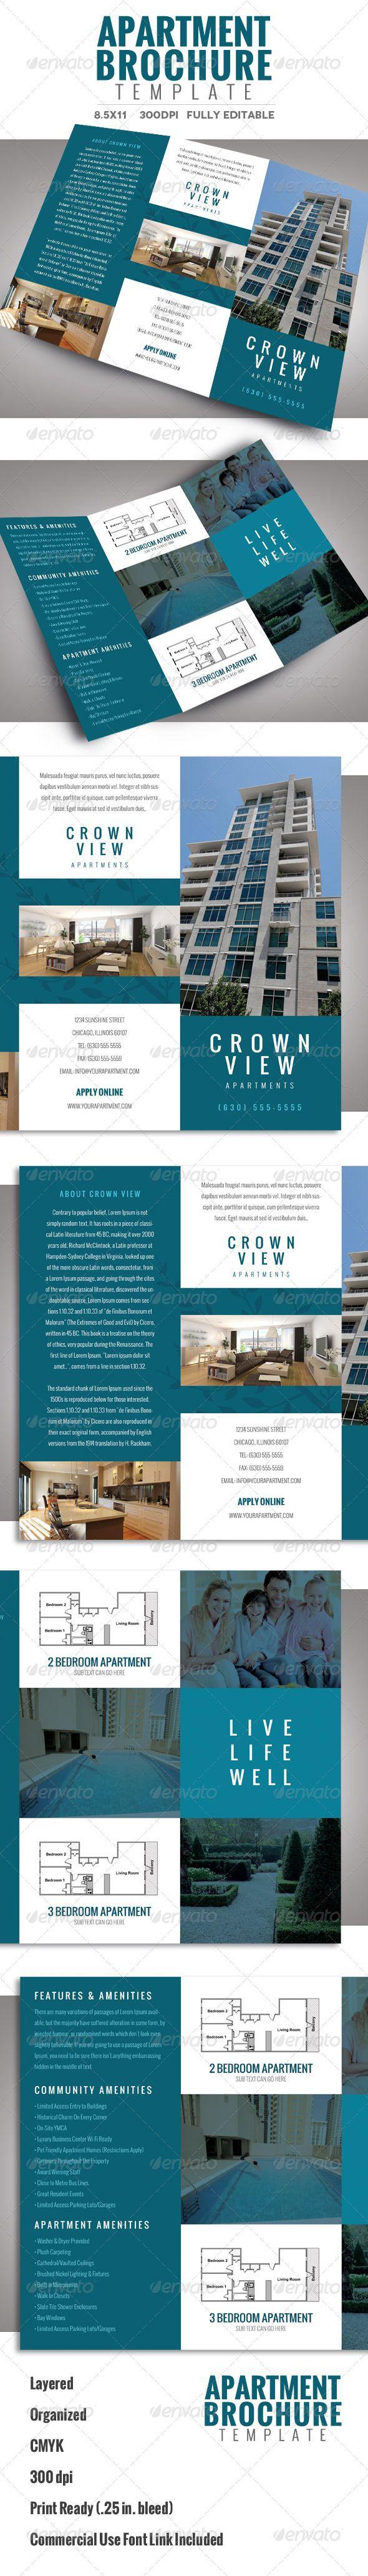 Apartment Brochure Template Httpgraphicriveritemapartment